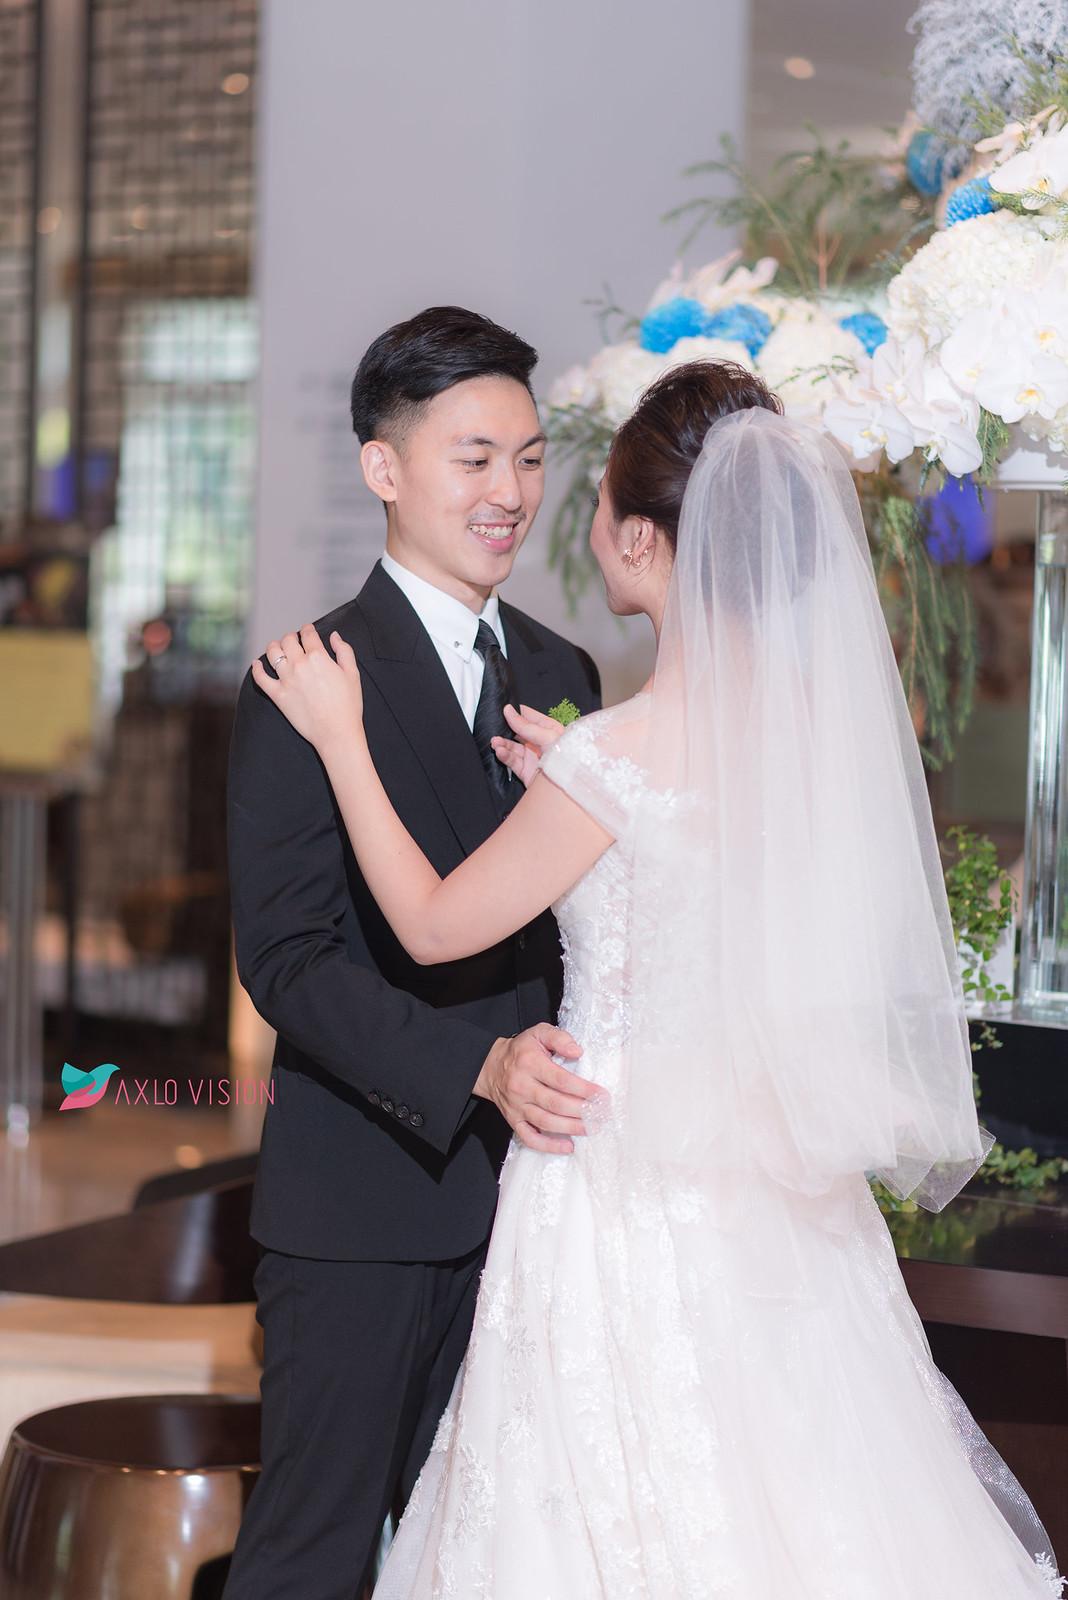 20170916 WeddingDay_084